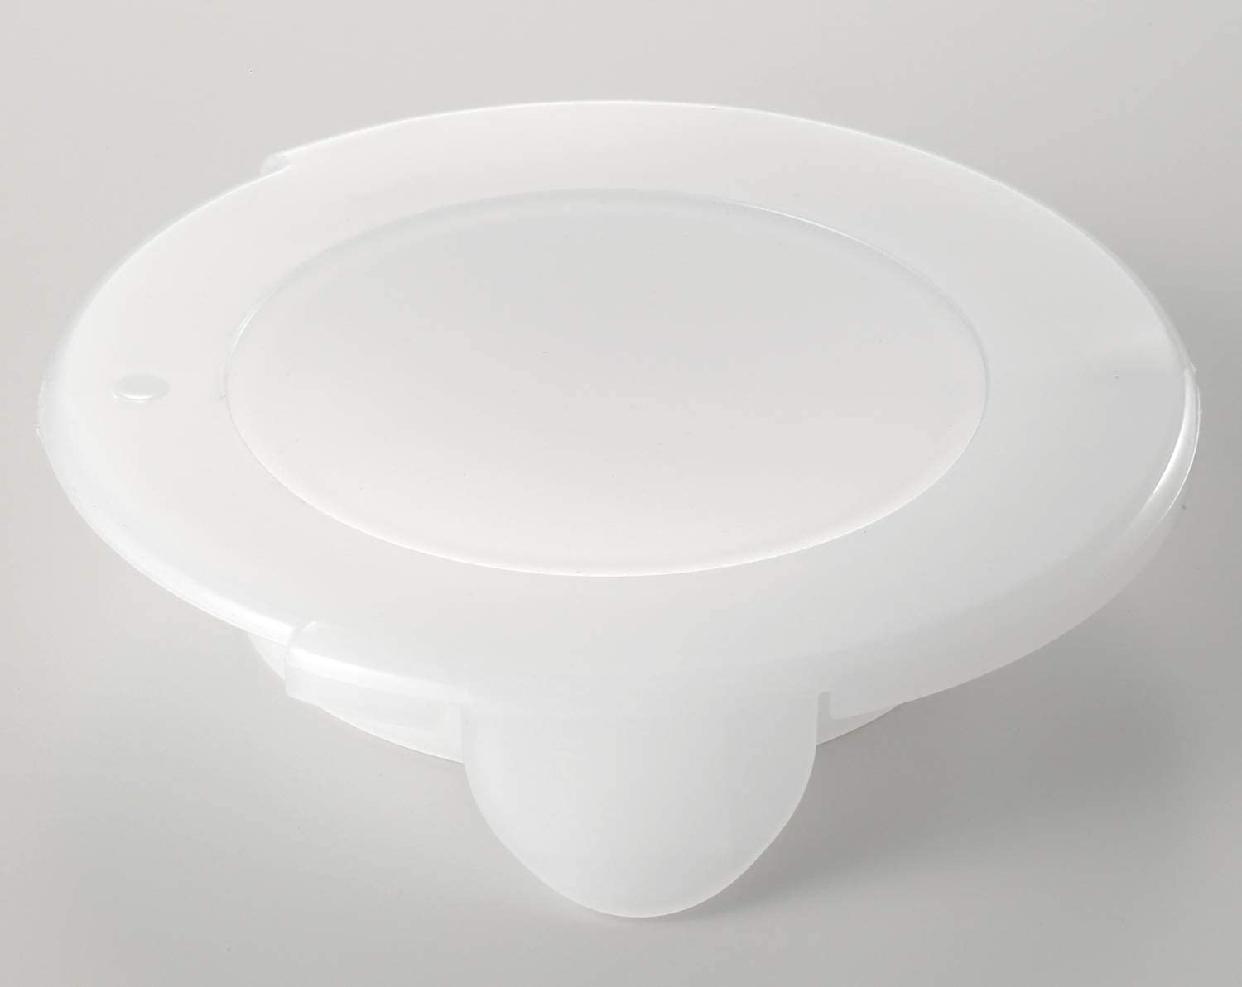 iwaki(イワキ) 角型サーバー ホワイト KT296K-Wの商品画像7